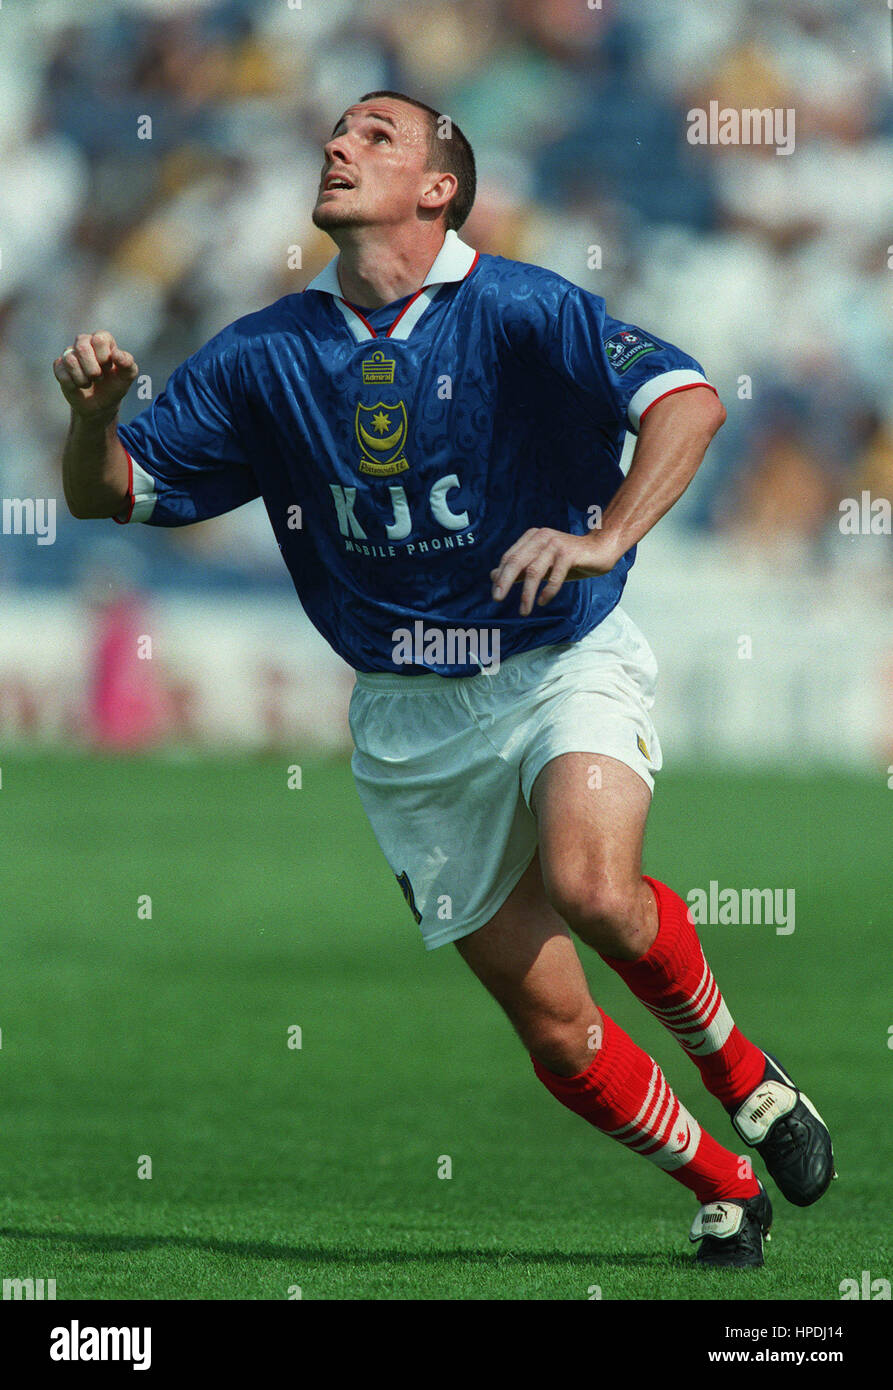 ROBBIE PETHICK PORTSMOUTH FC 18 Août 1997 Banque D'Images